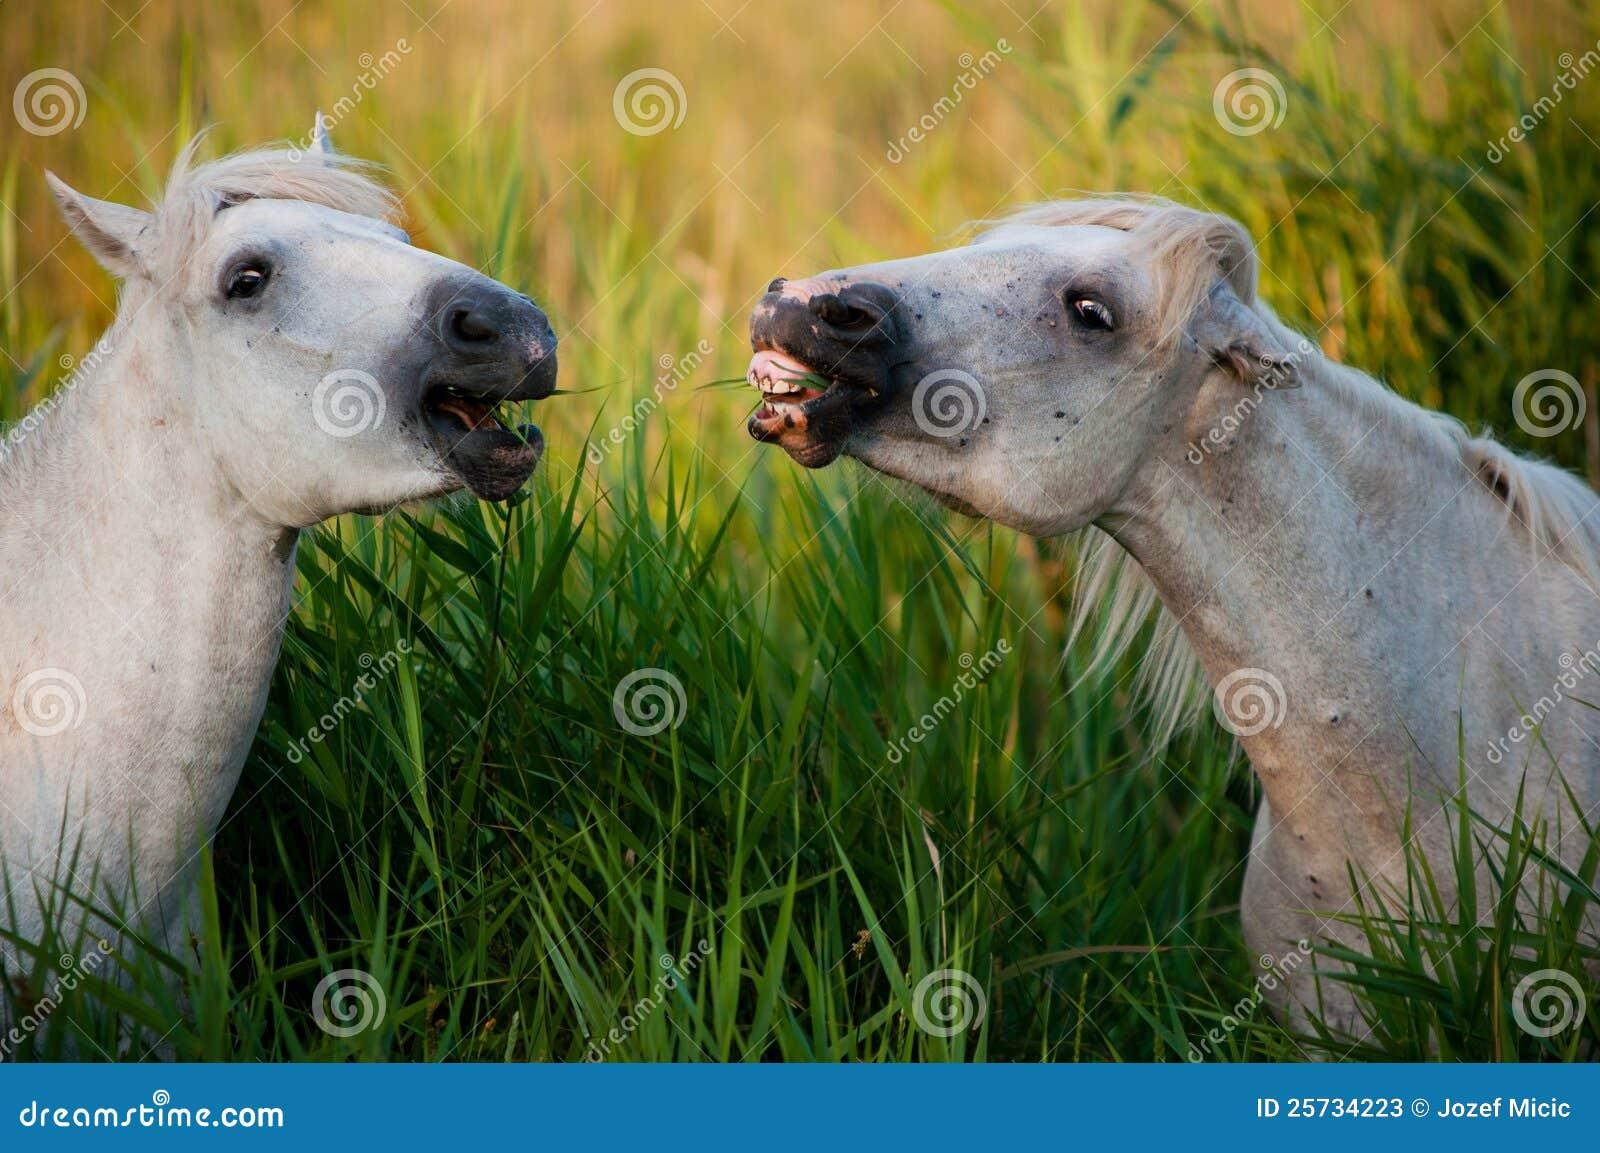 White horse eating grass - photo#19